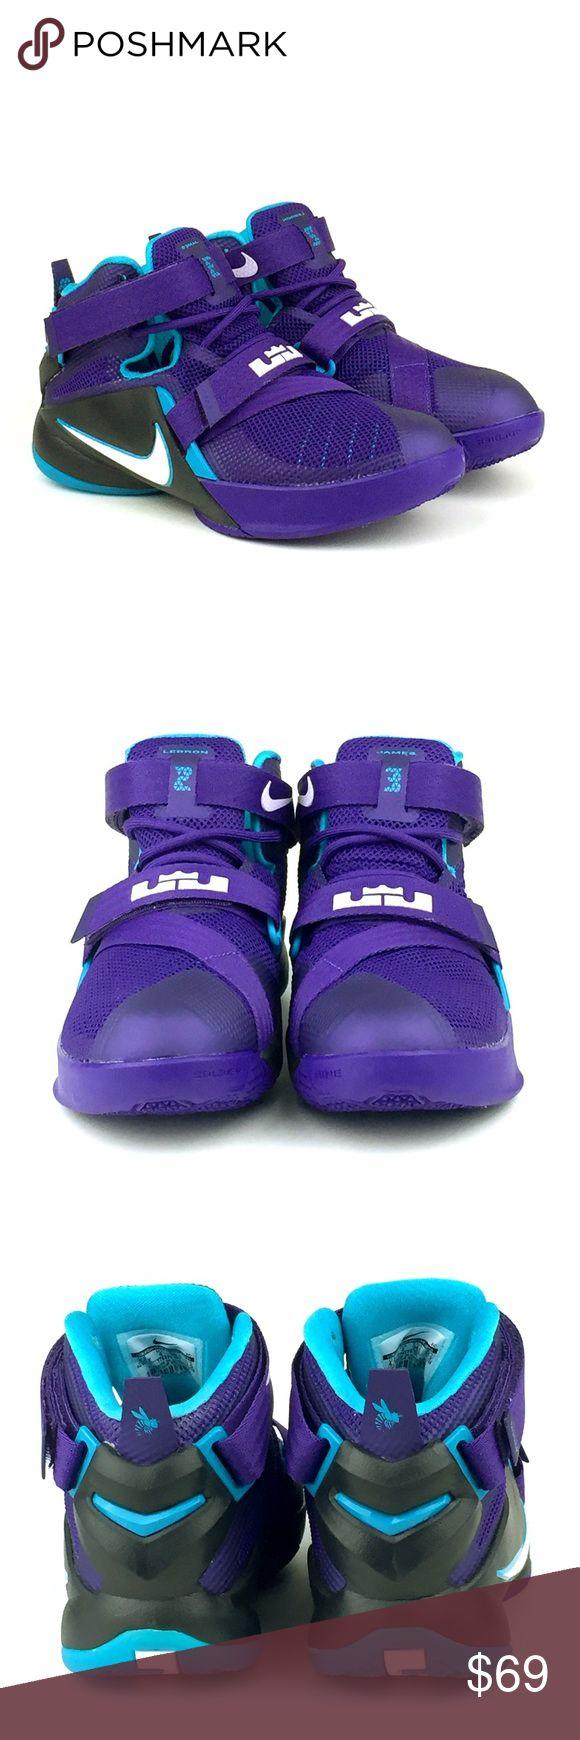 online store 82e8b 44513 ... Nike Lebron Soldier IX Basketball Sneaker NWOB Nike Lebron Soldiers IX,  Basketball Sneaker, Youth  NIKE Lebron Soldier 9 IX 776471-501 Purple Black  Blue ...